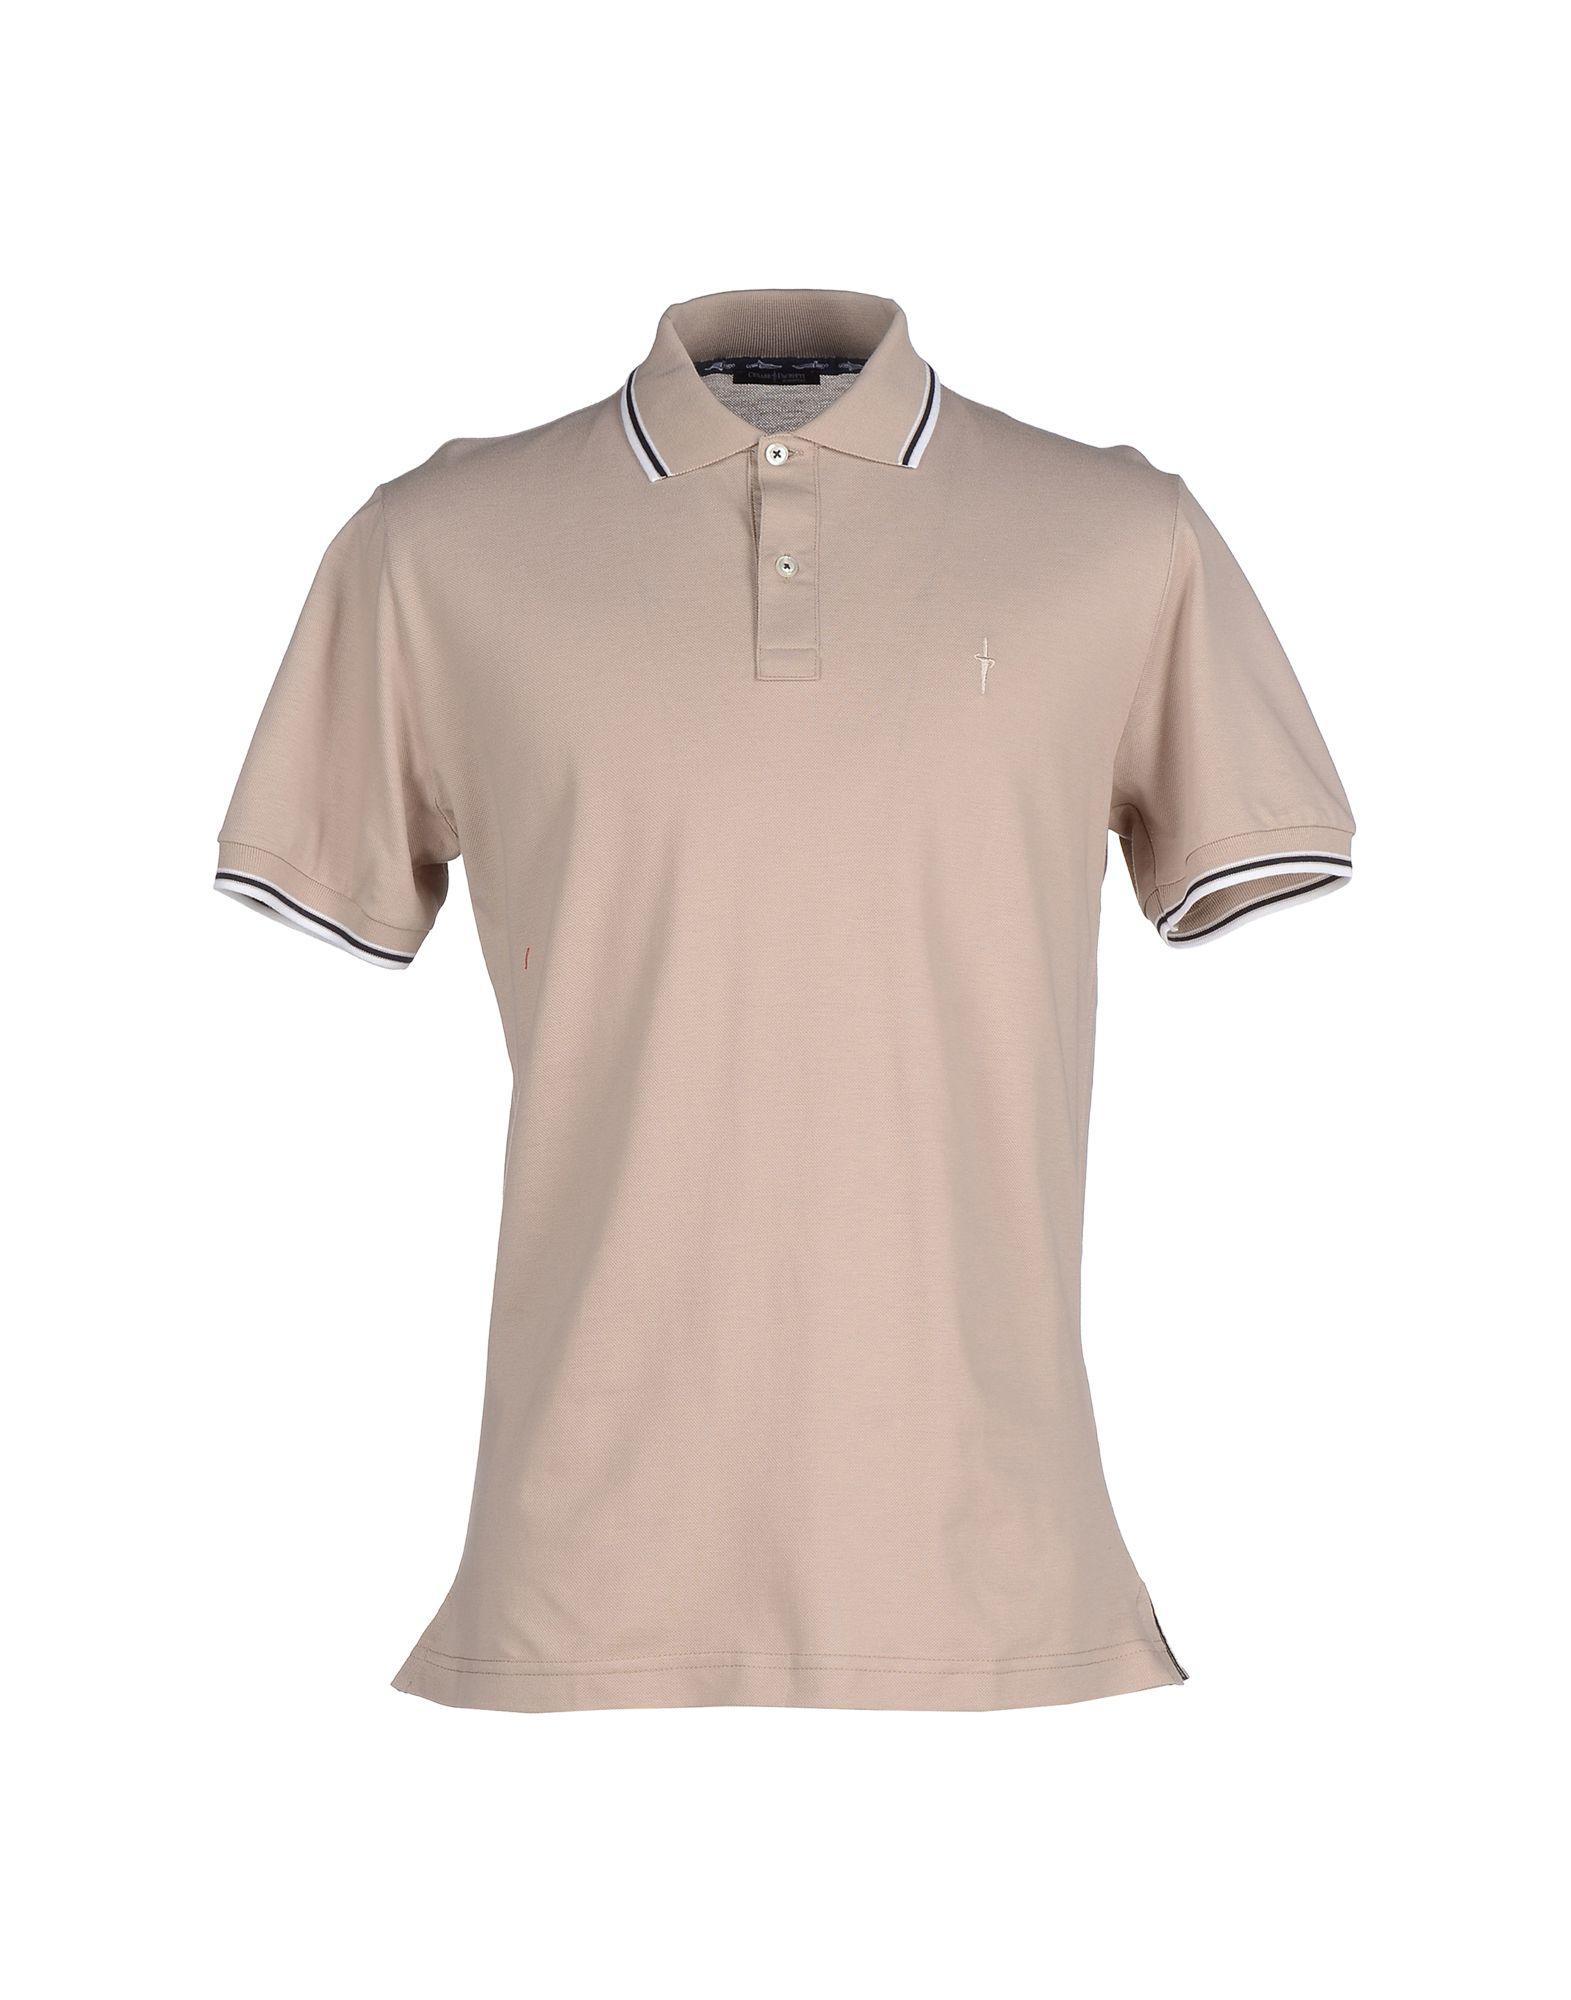 Cesare paciotti polo shirt in brown for men light brown for Light brown polo shirt